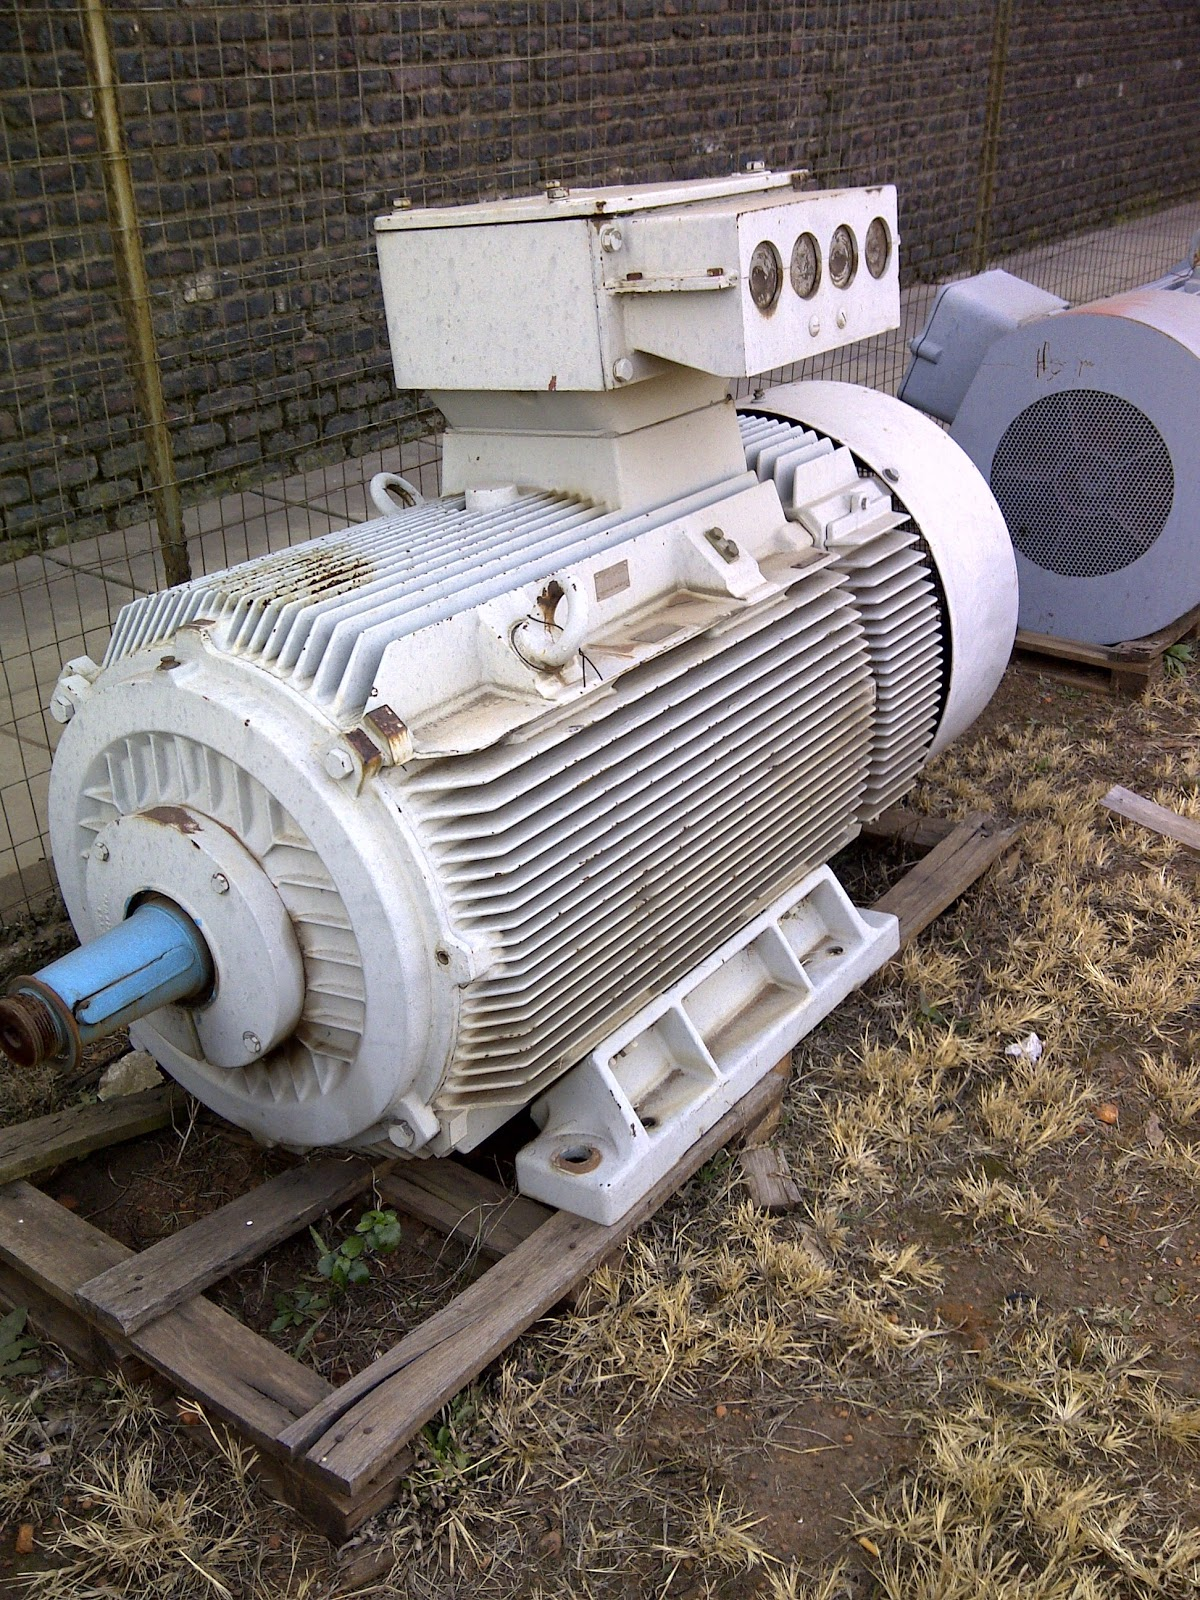 Indusquip Wem High Efficiency Electric Motors And Invt Ac